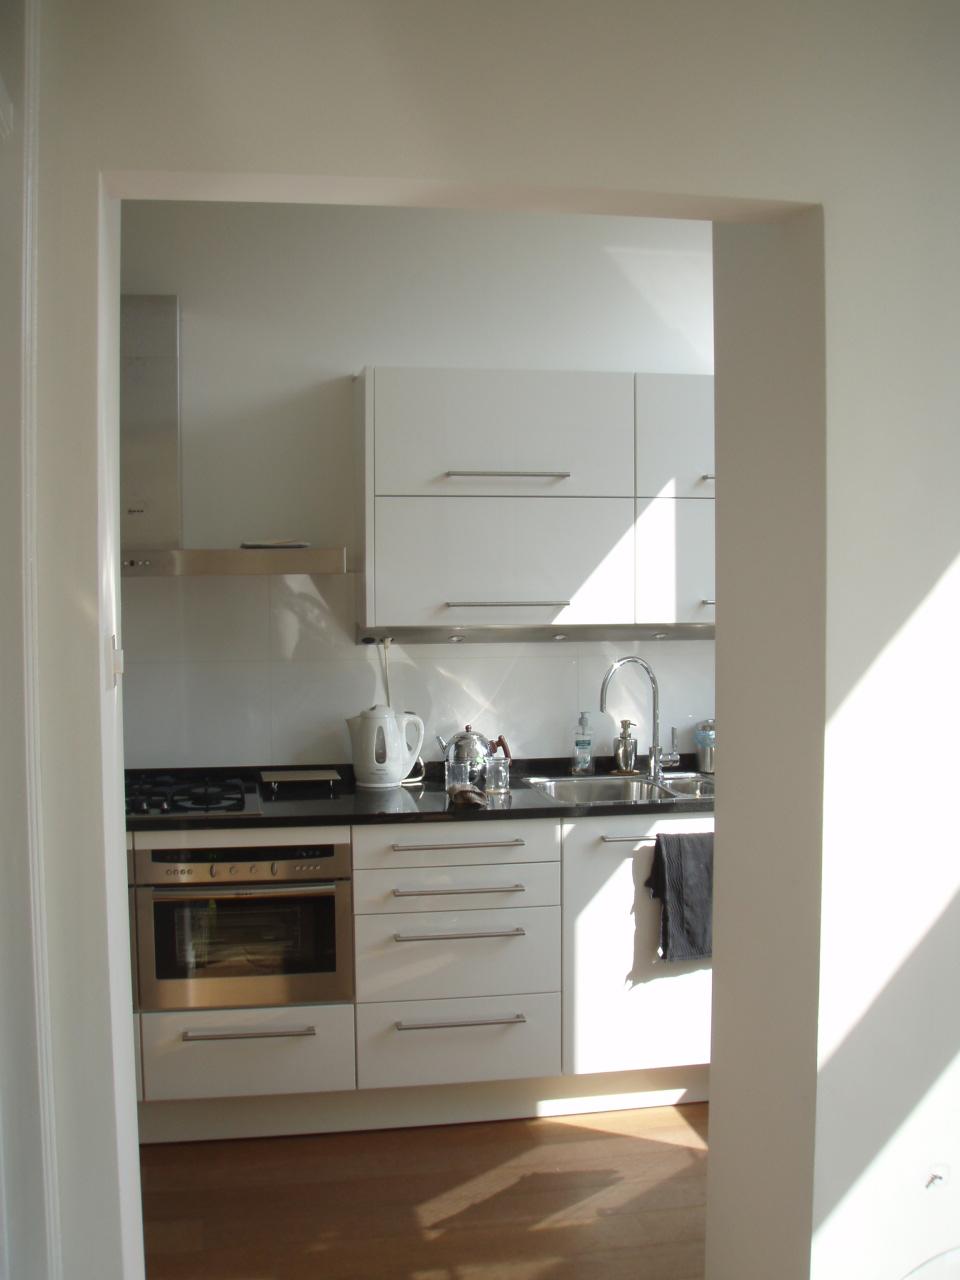 18. nieuwe sparing in wand woonkamer keuken | RR Bouwadvies